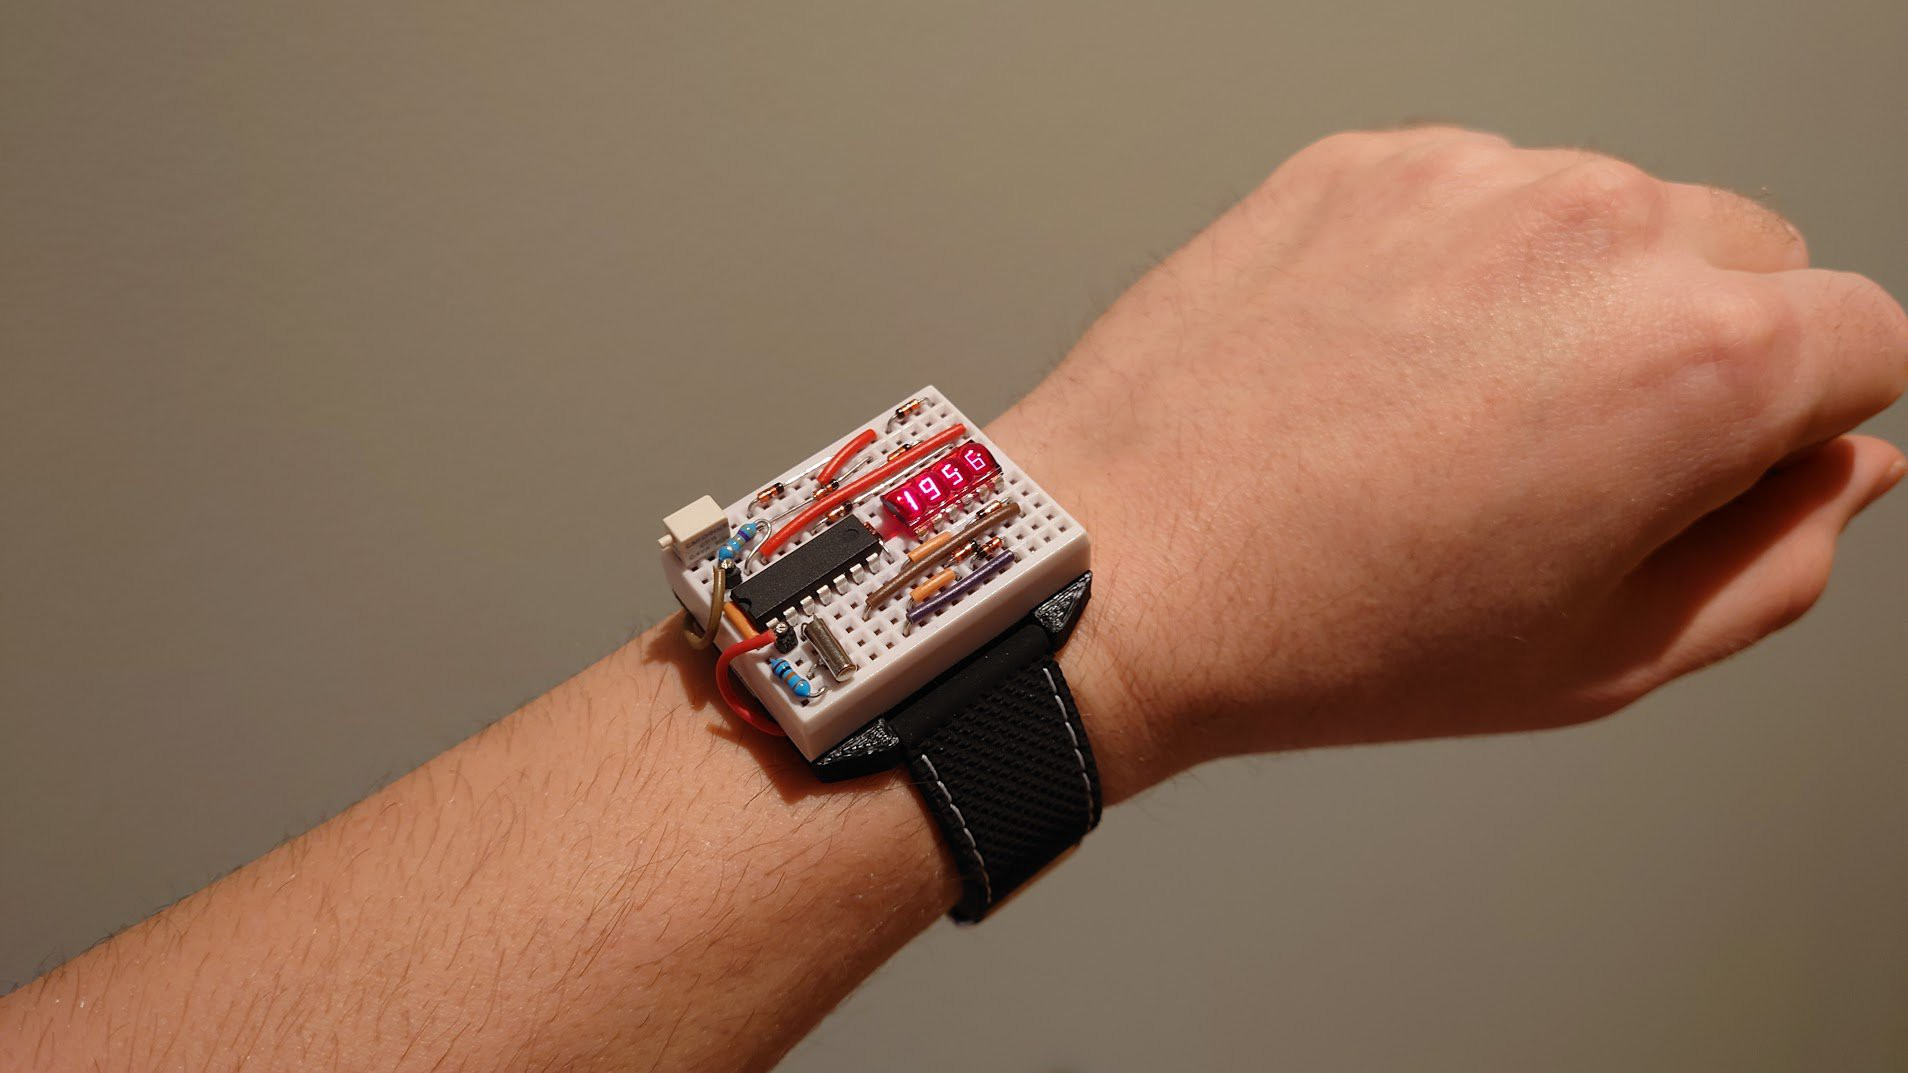 Electronic breadboard wristwatch on an arm